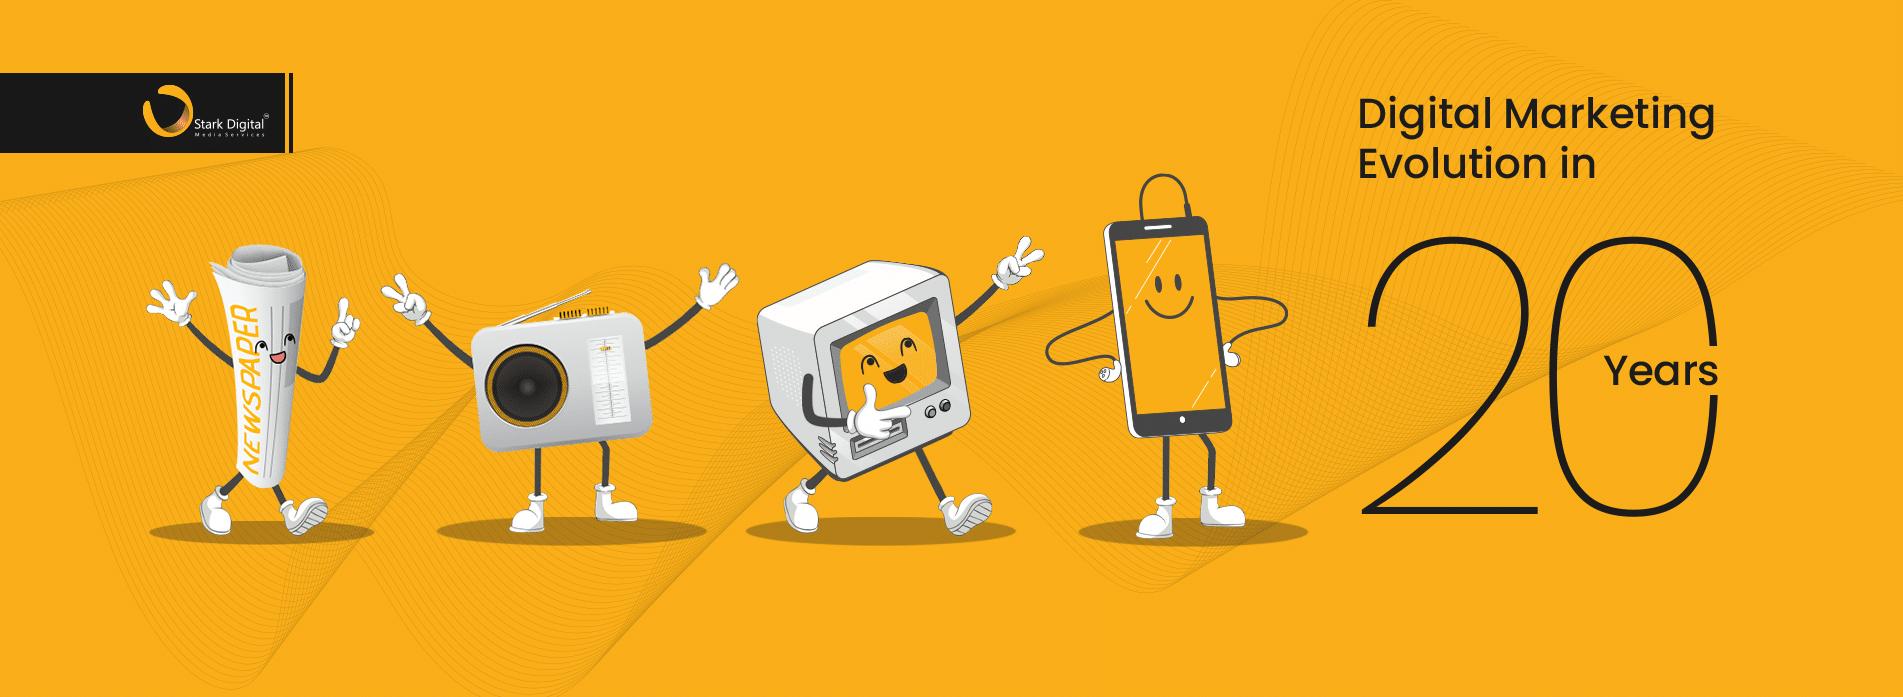 Digital Marketing Evolution in 20 Years